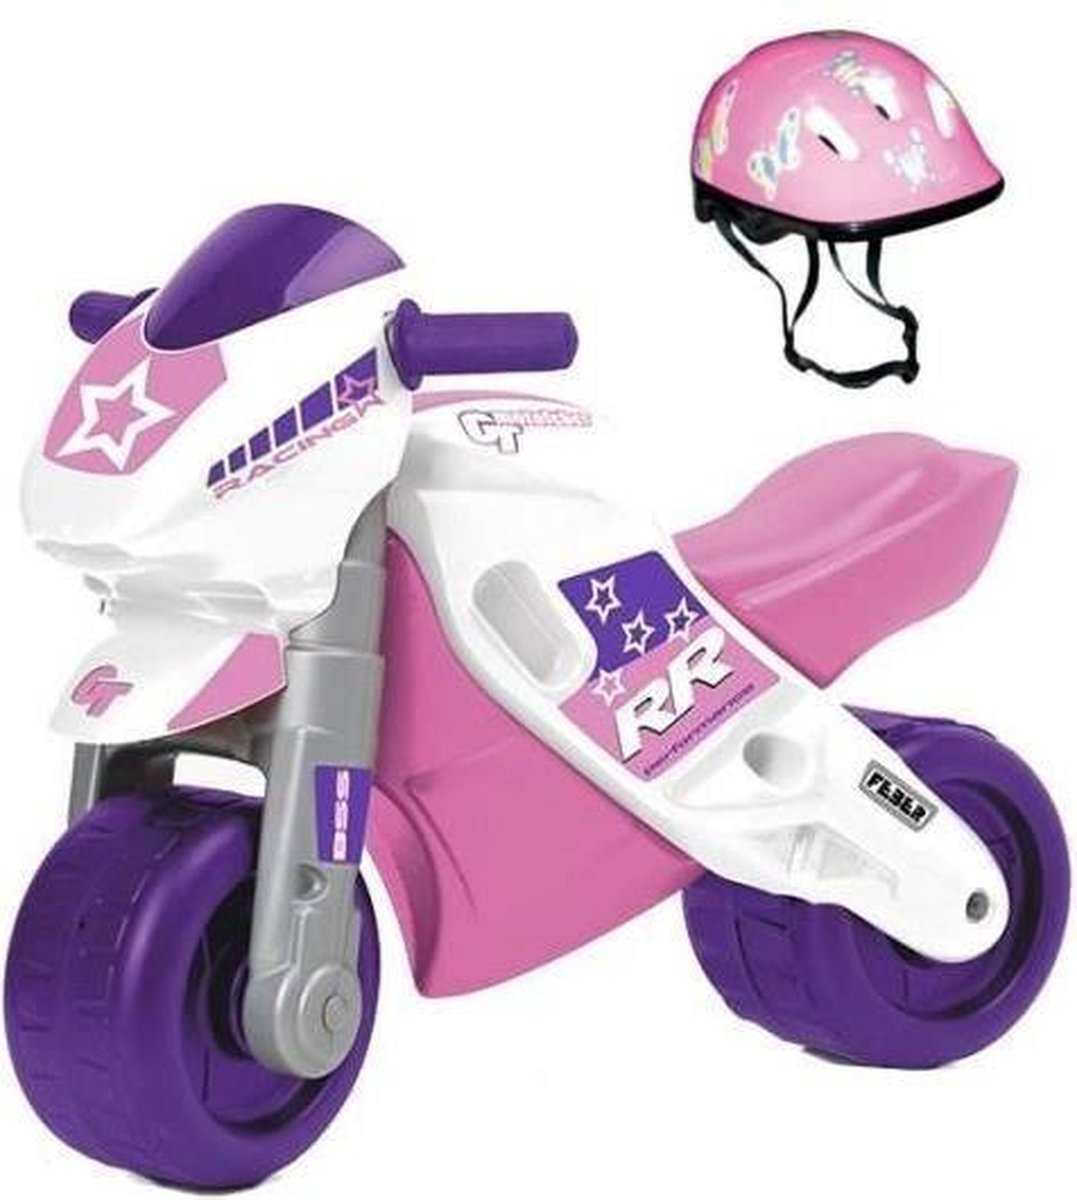 Feber Motofeber 2 Racing Pink